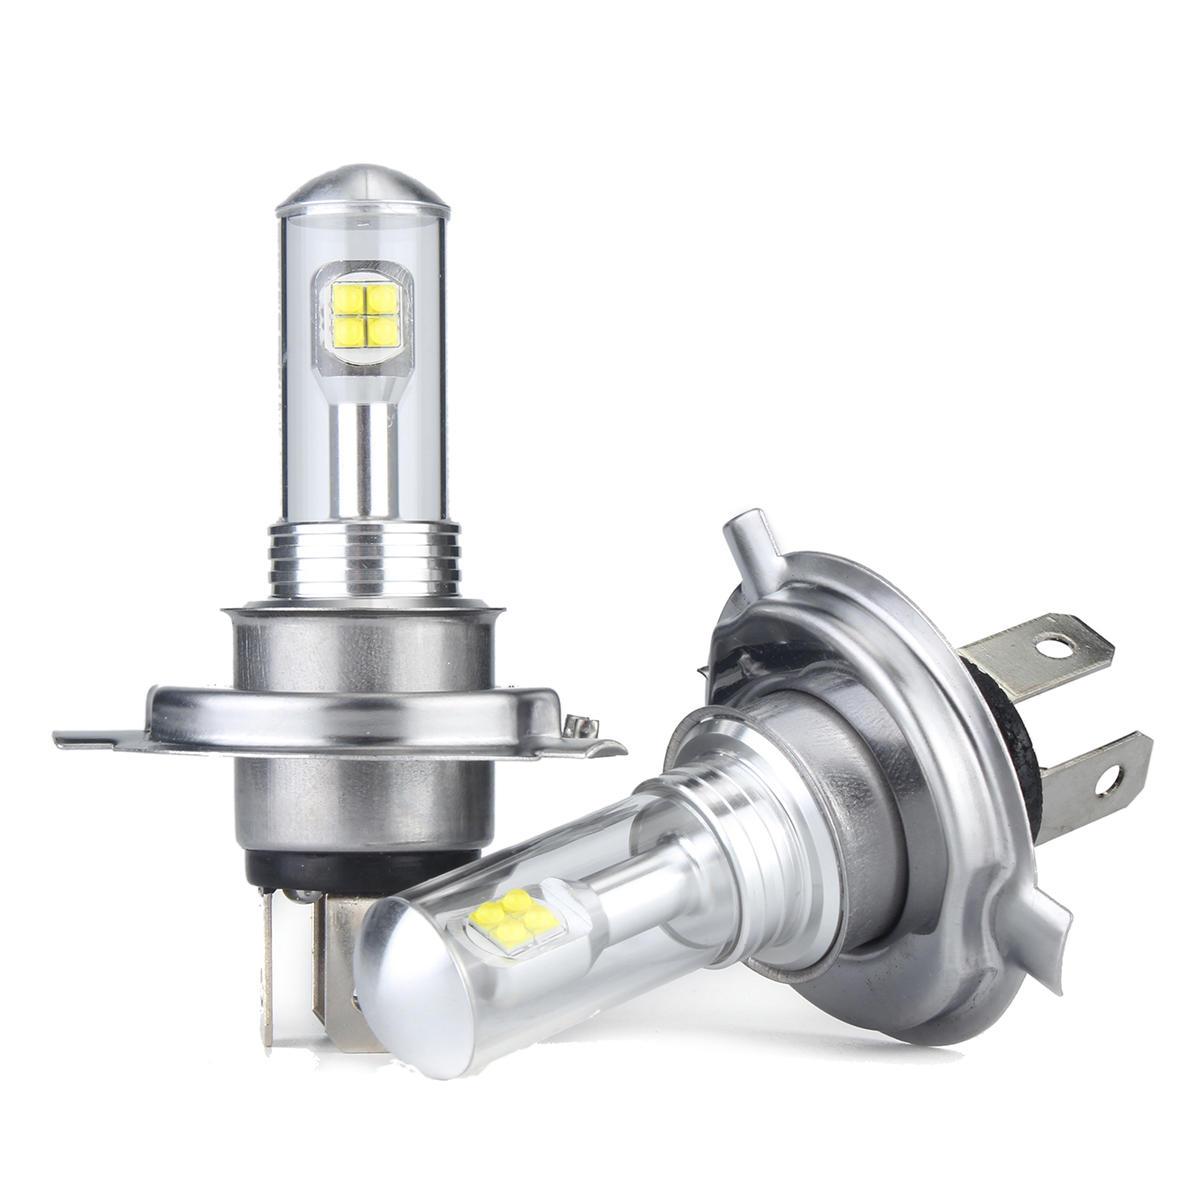 Autoleader 80W 1500LM LED Car Headlights Fog Lamps H1 H3 H4 H7 H11 H16 9005  9006 6000K